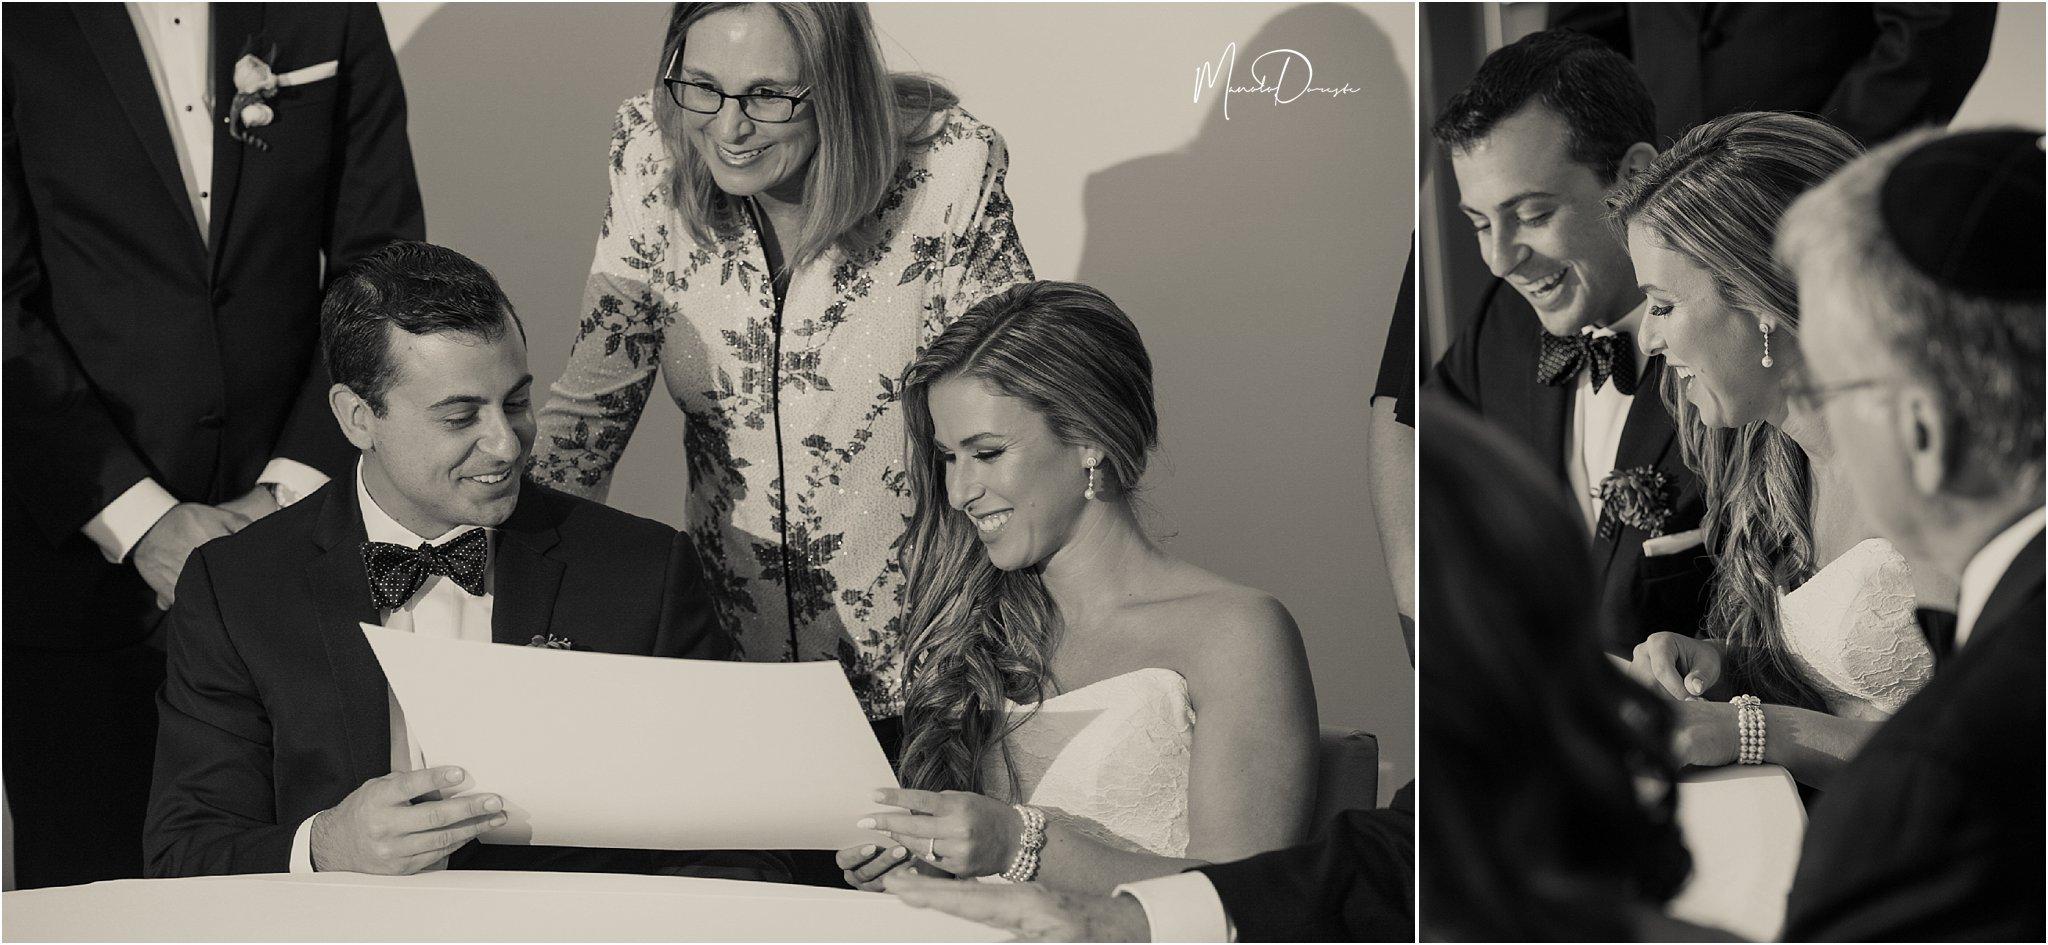 0666_ManoloDoreste_InFocusStudios_Wedding_Family_Photography_Miami_MiamiPhotographer.jpg